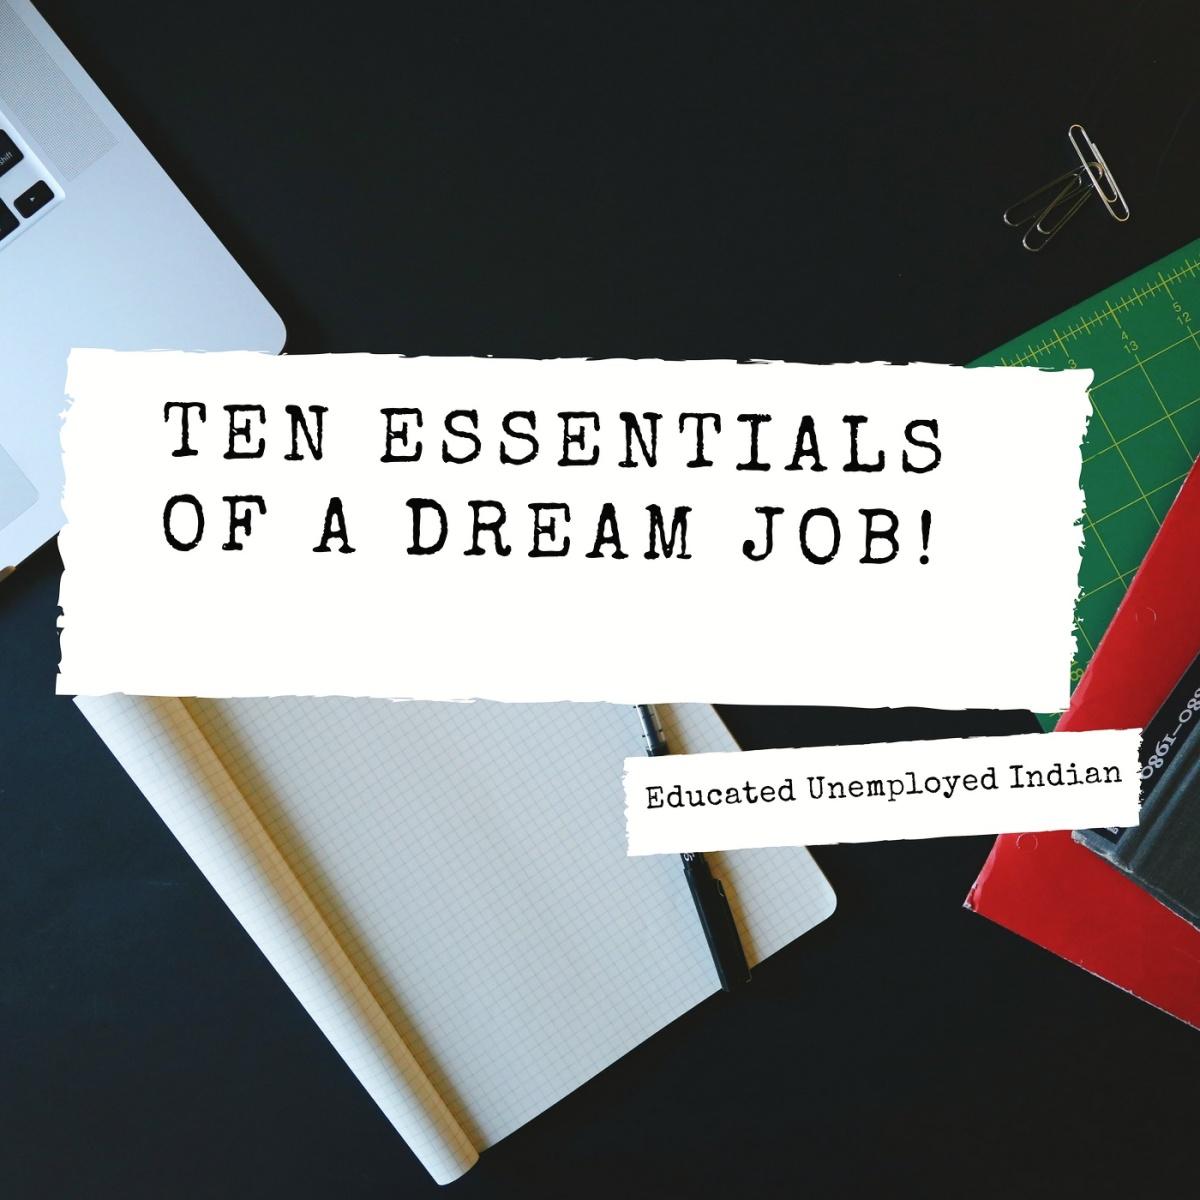 The Top Ten Essentials of the Ultimate Dream Job!